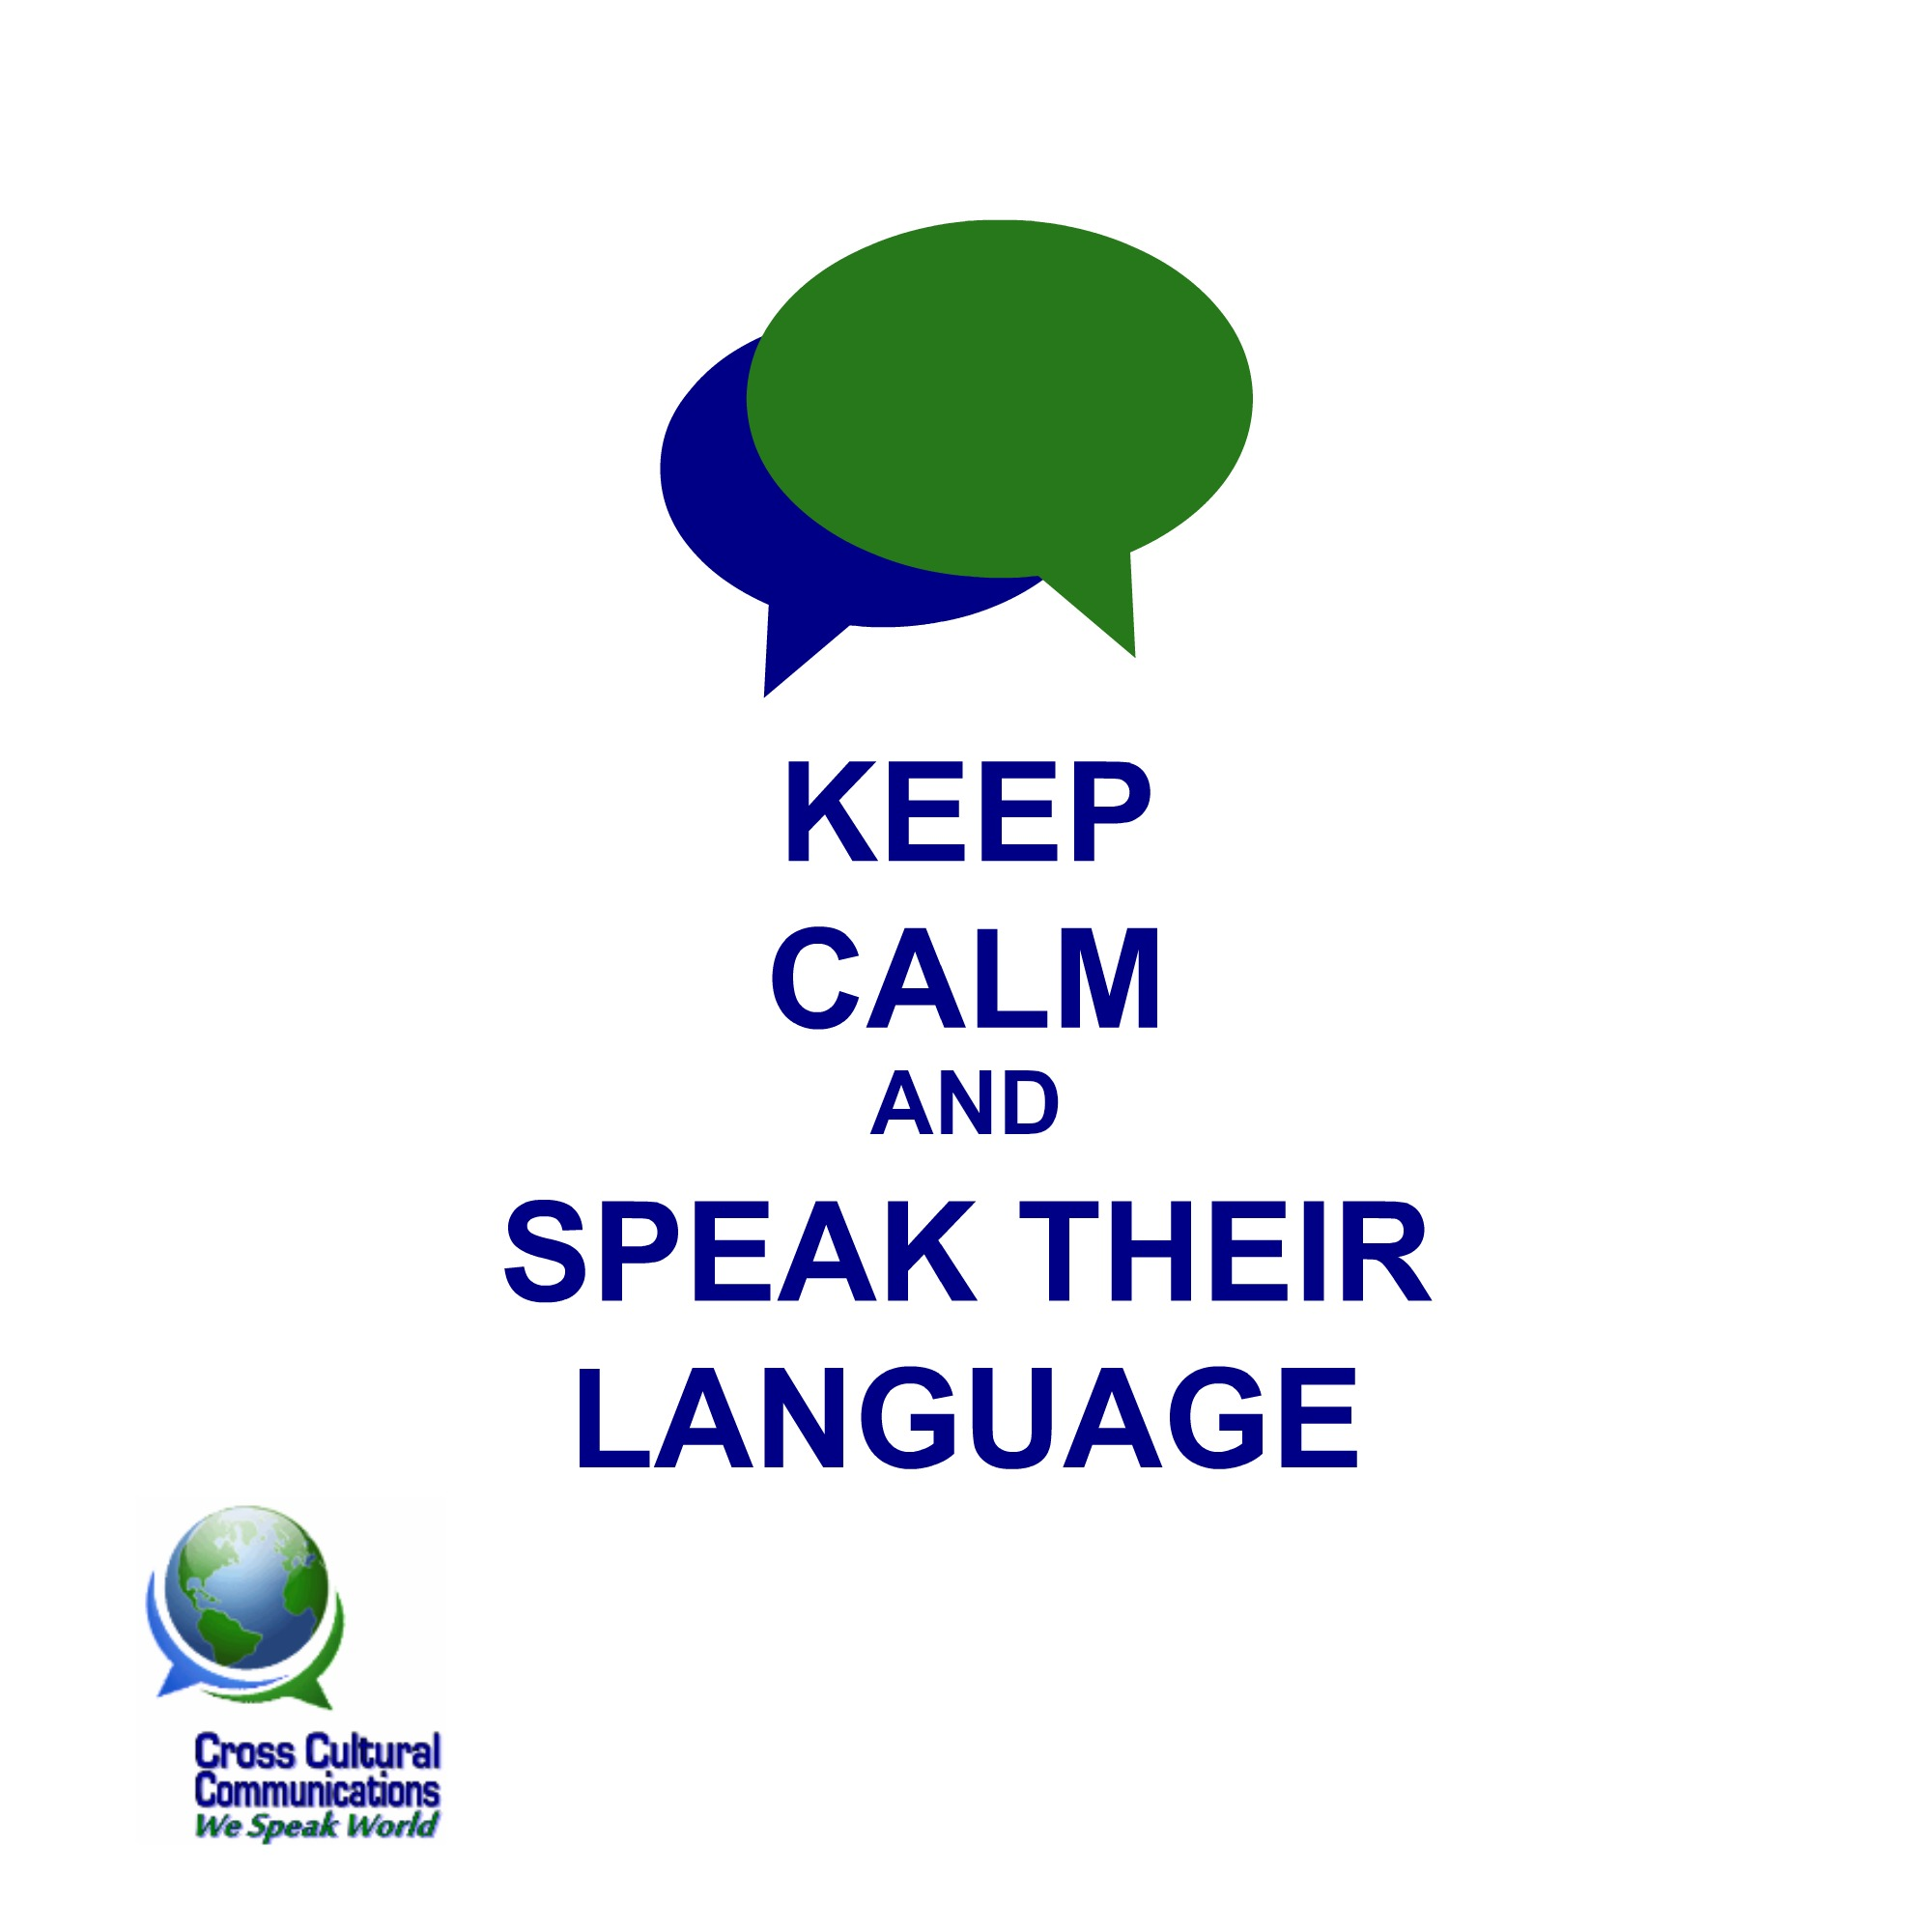 We Speak Their Language